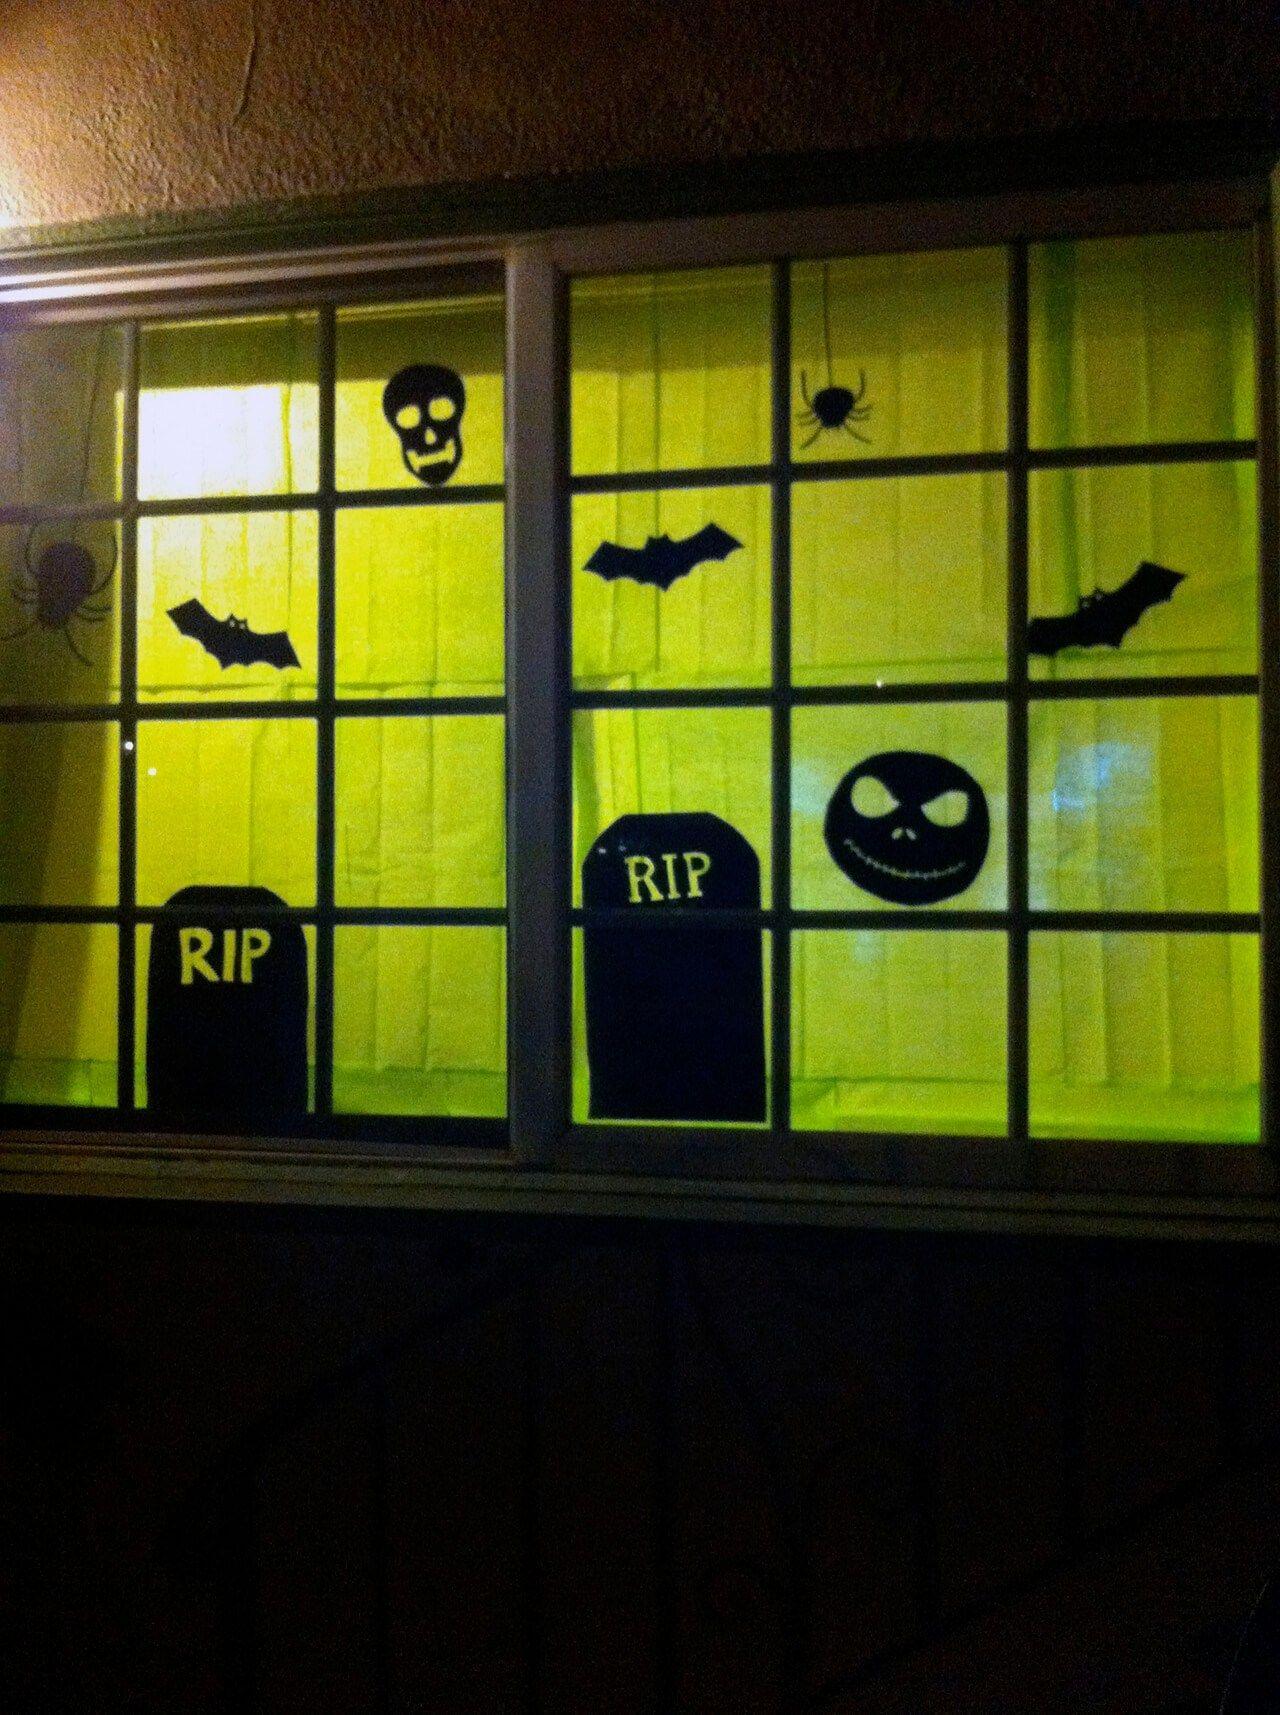 46+ Diy halloween window silhouettes ideas in 2021